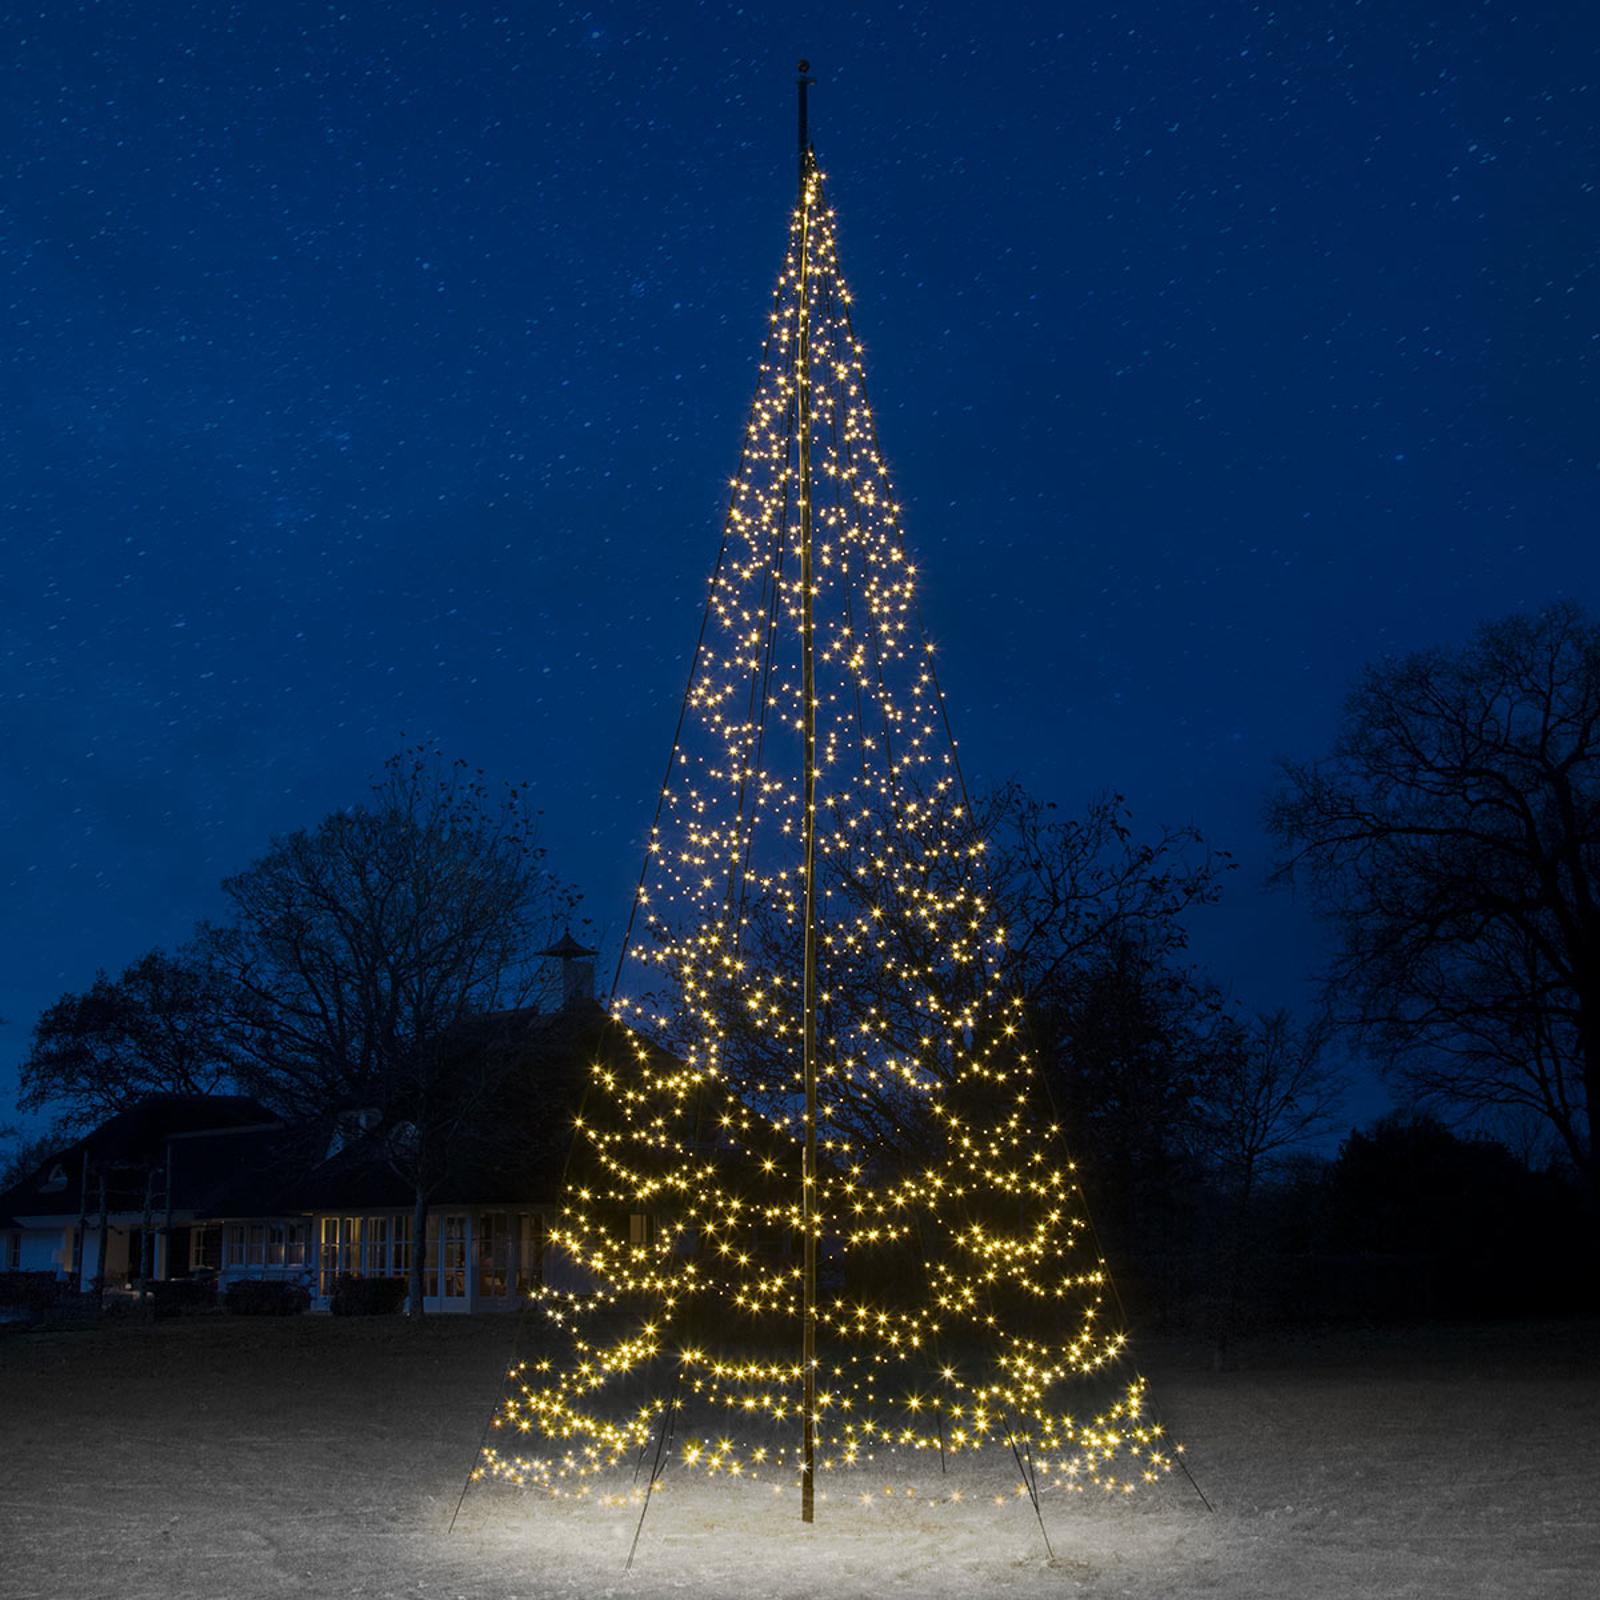 Fairybell® Weihnachtsbaum, 8 m, 1500 LEDs